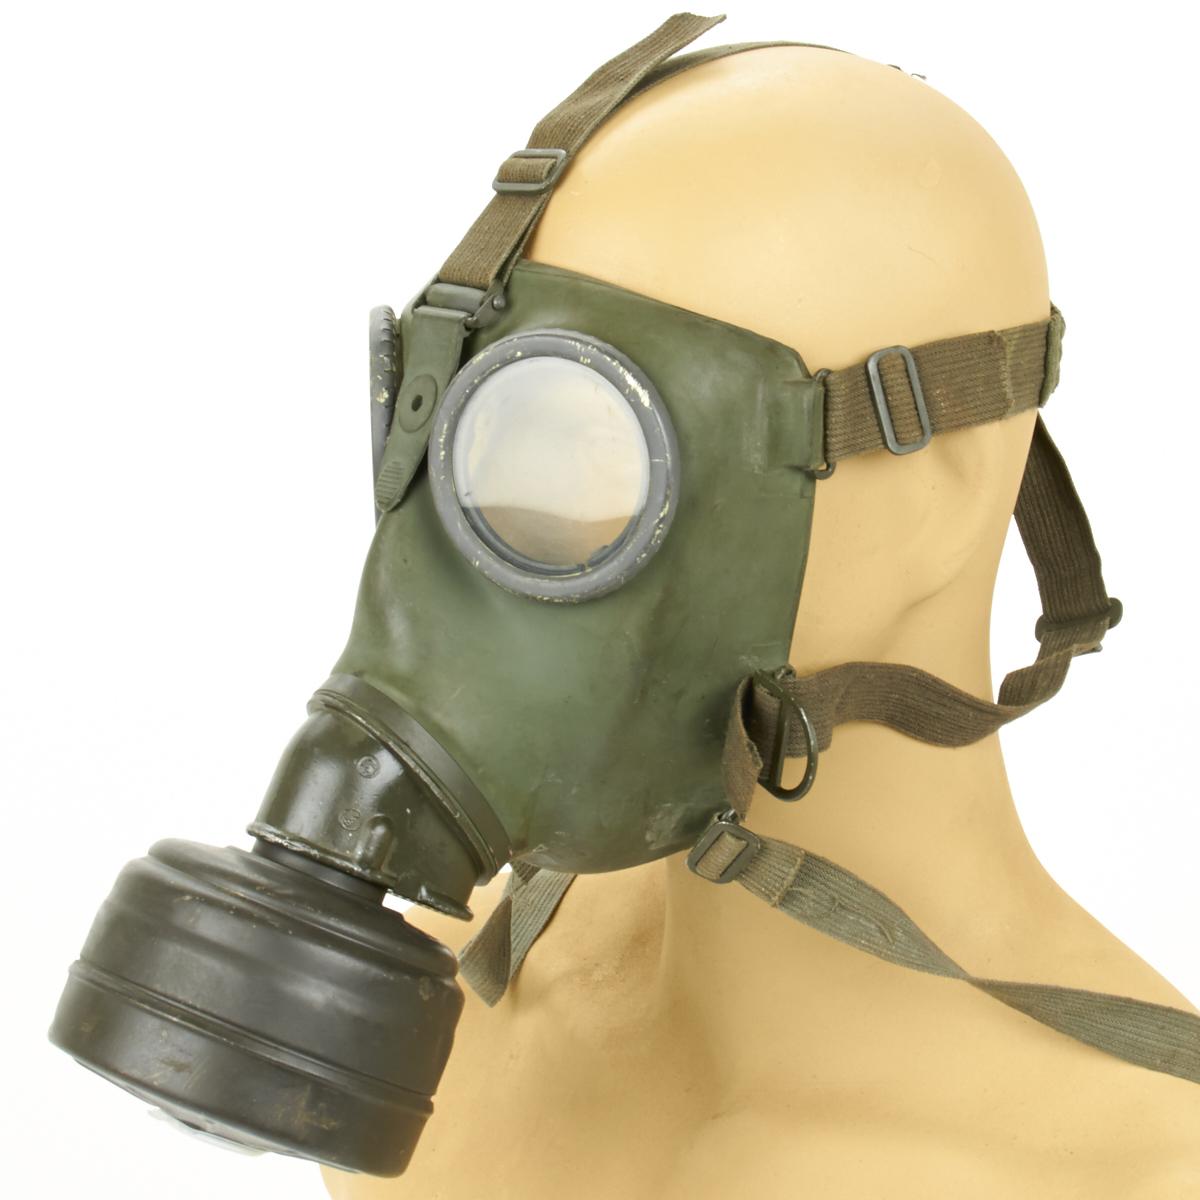 Original German WWII M-38 Gas Mask & Filter - Excellent ...